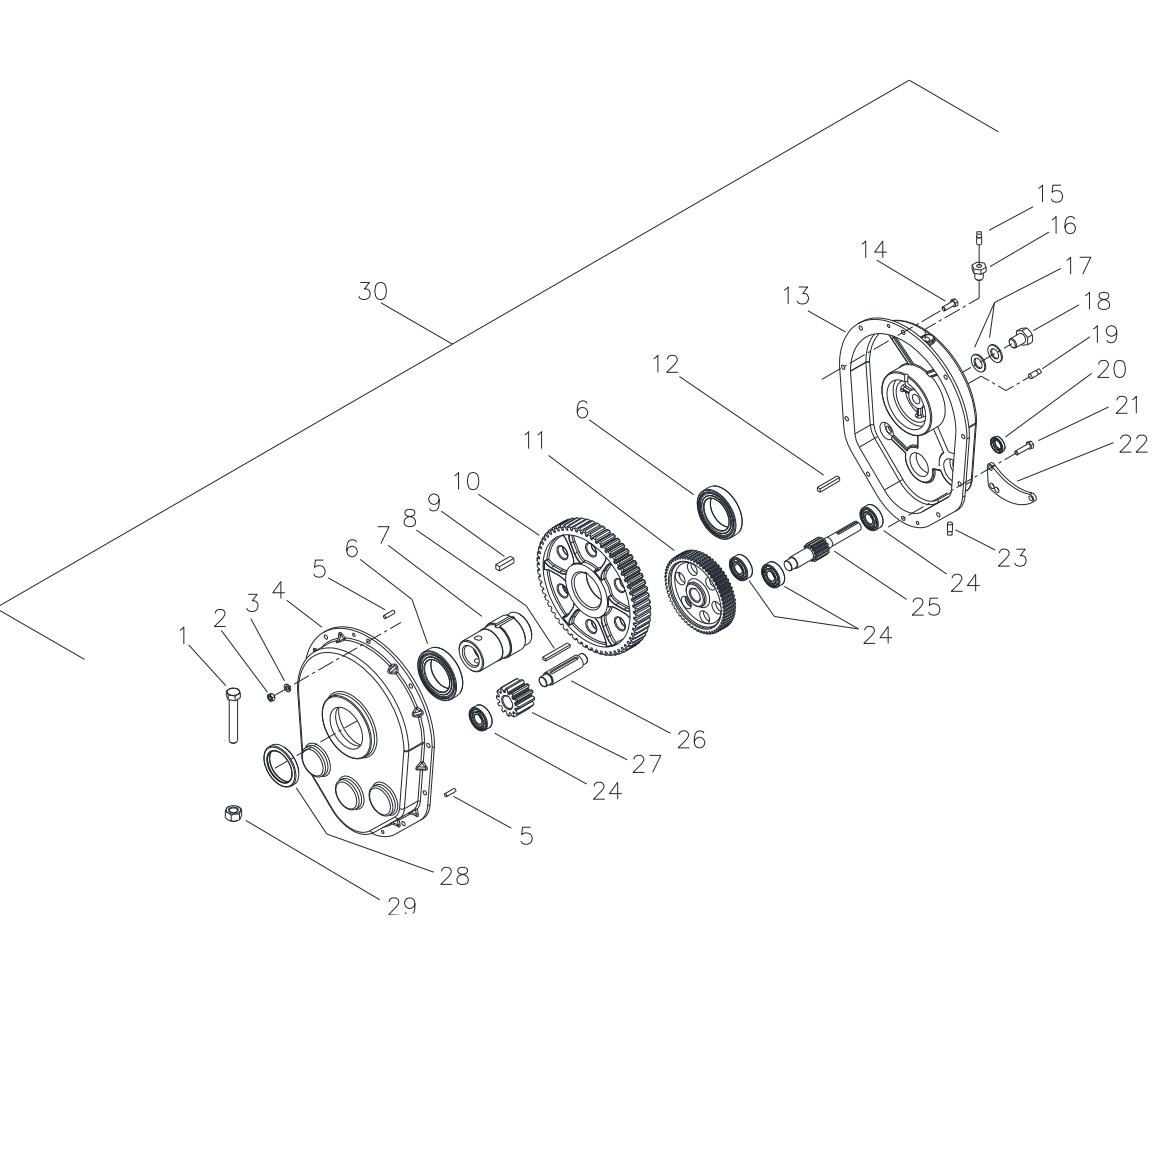 S10 S Crown Construction Mortar Mixer Parts